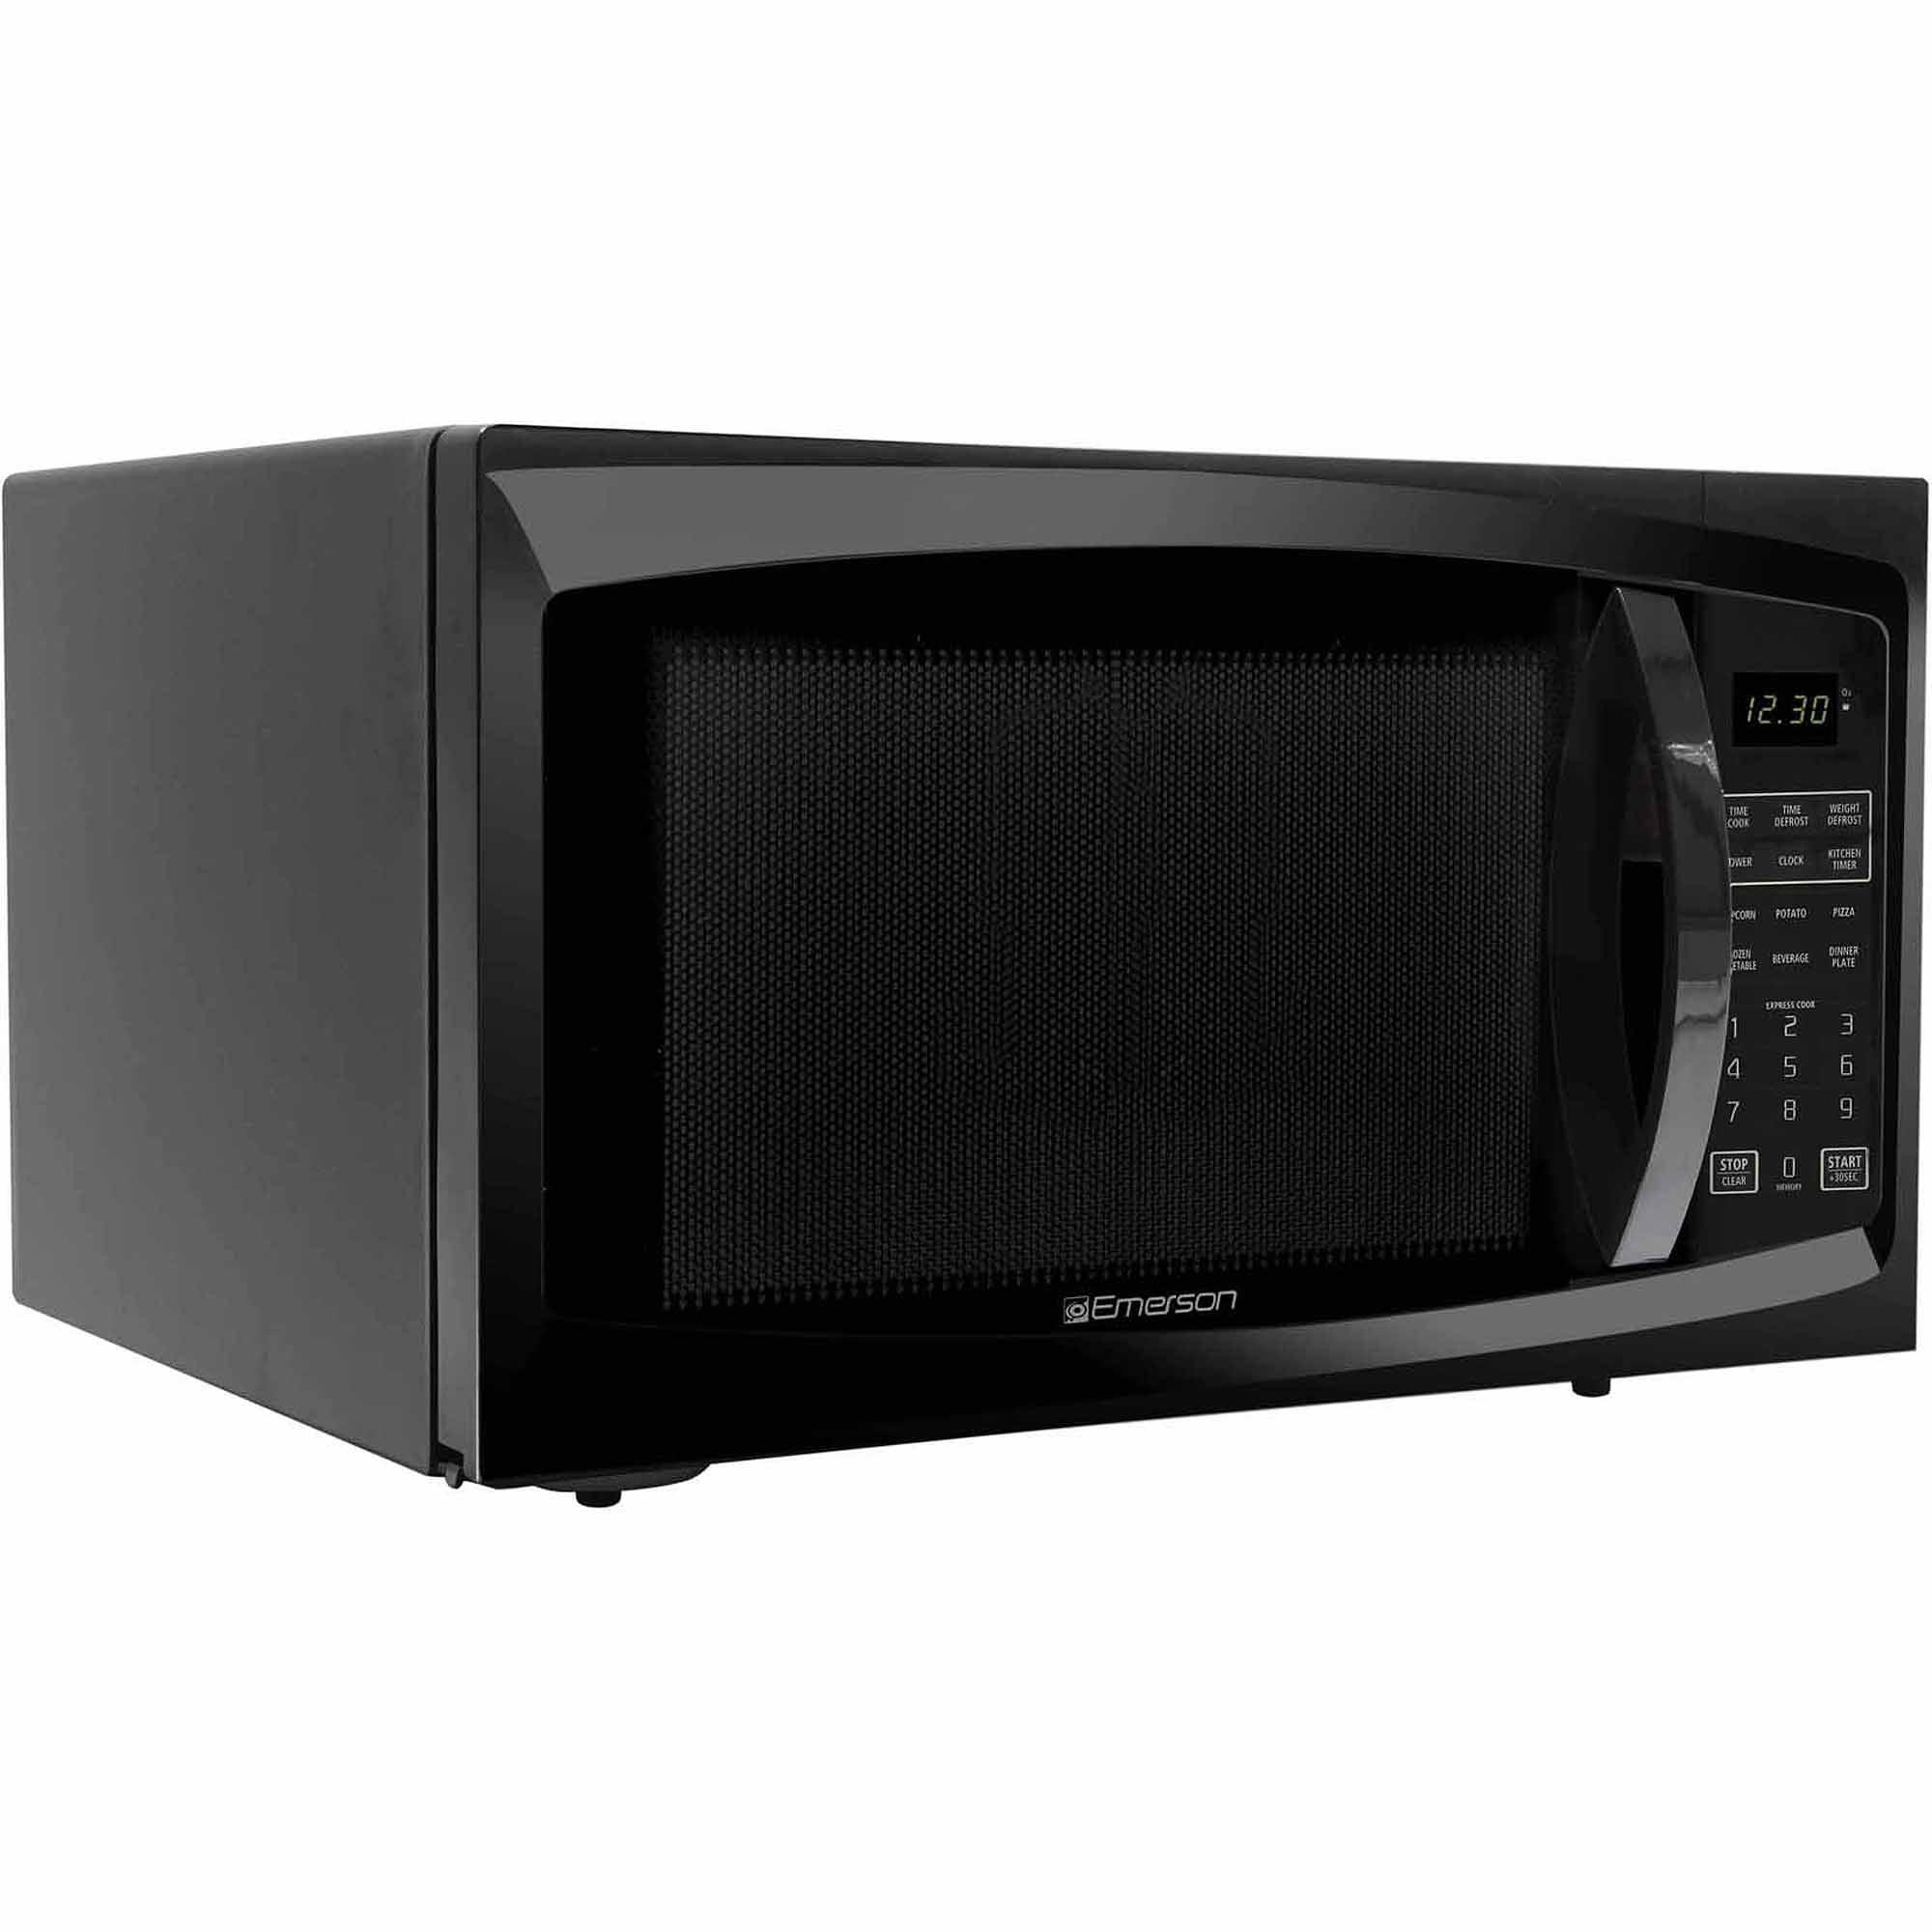 refurbished emerson 1 6 cu ft 1100 watt microwave oven black